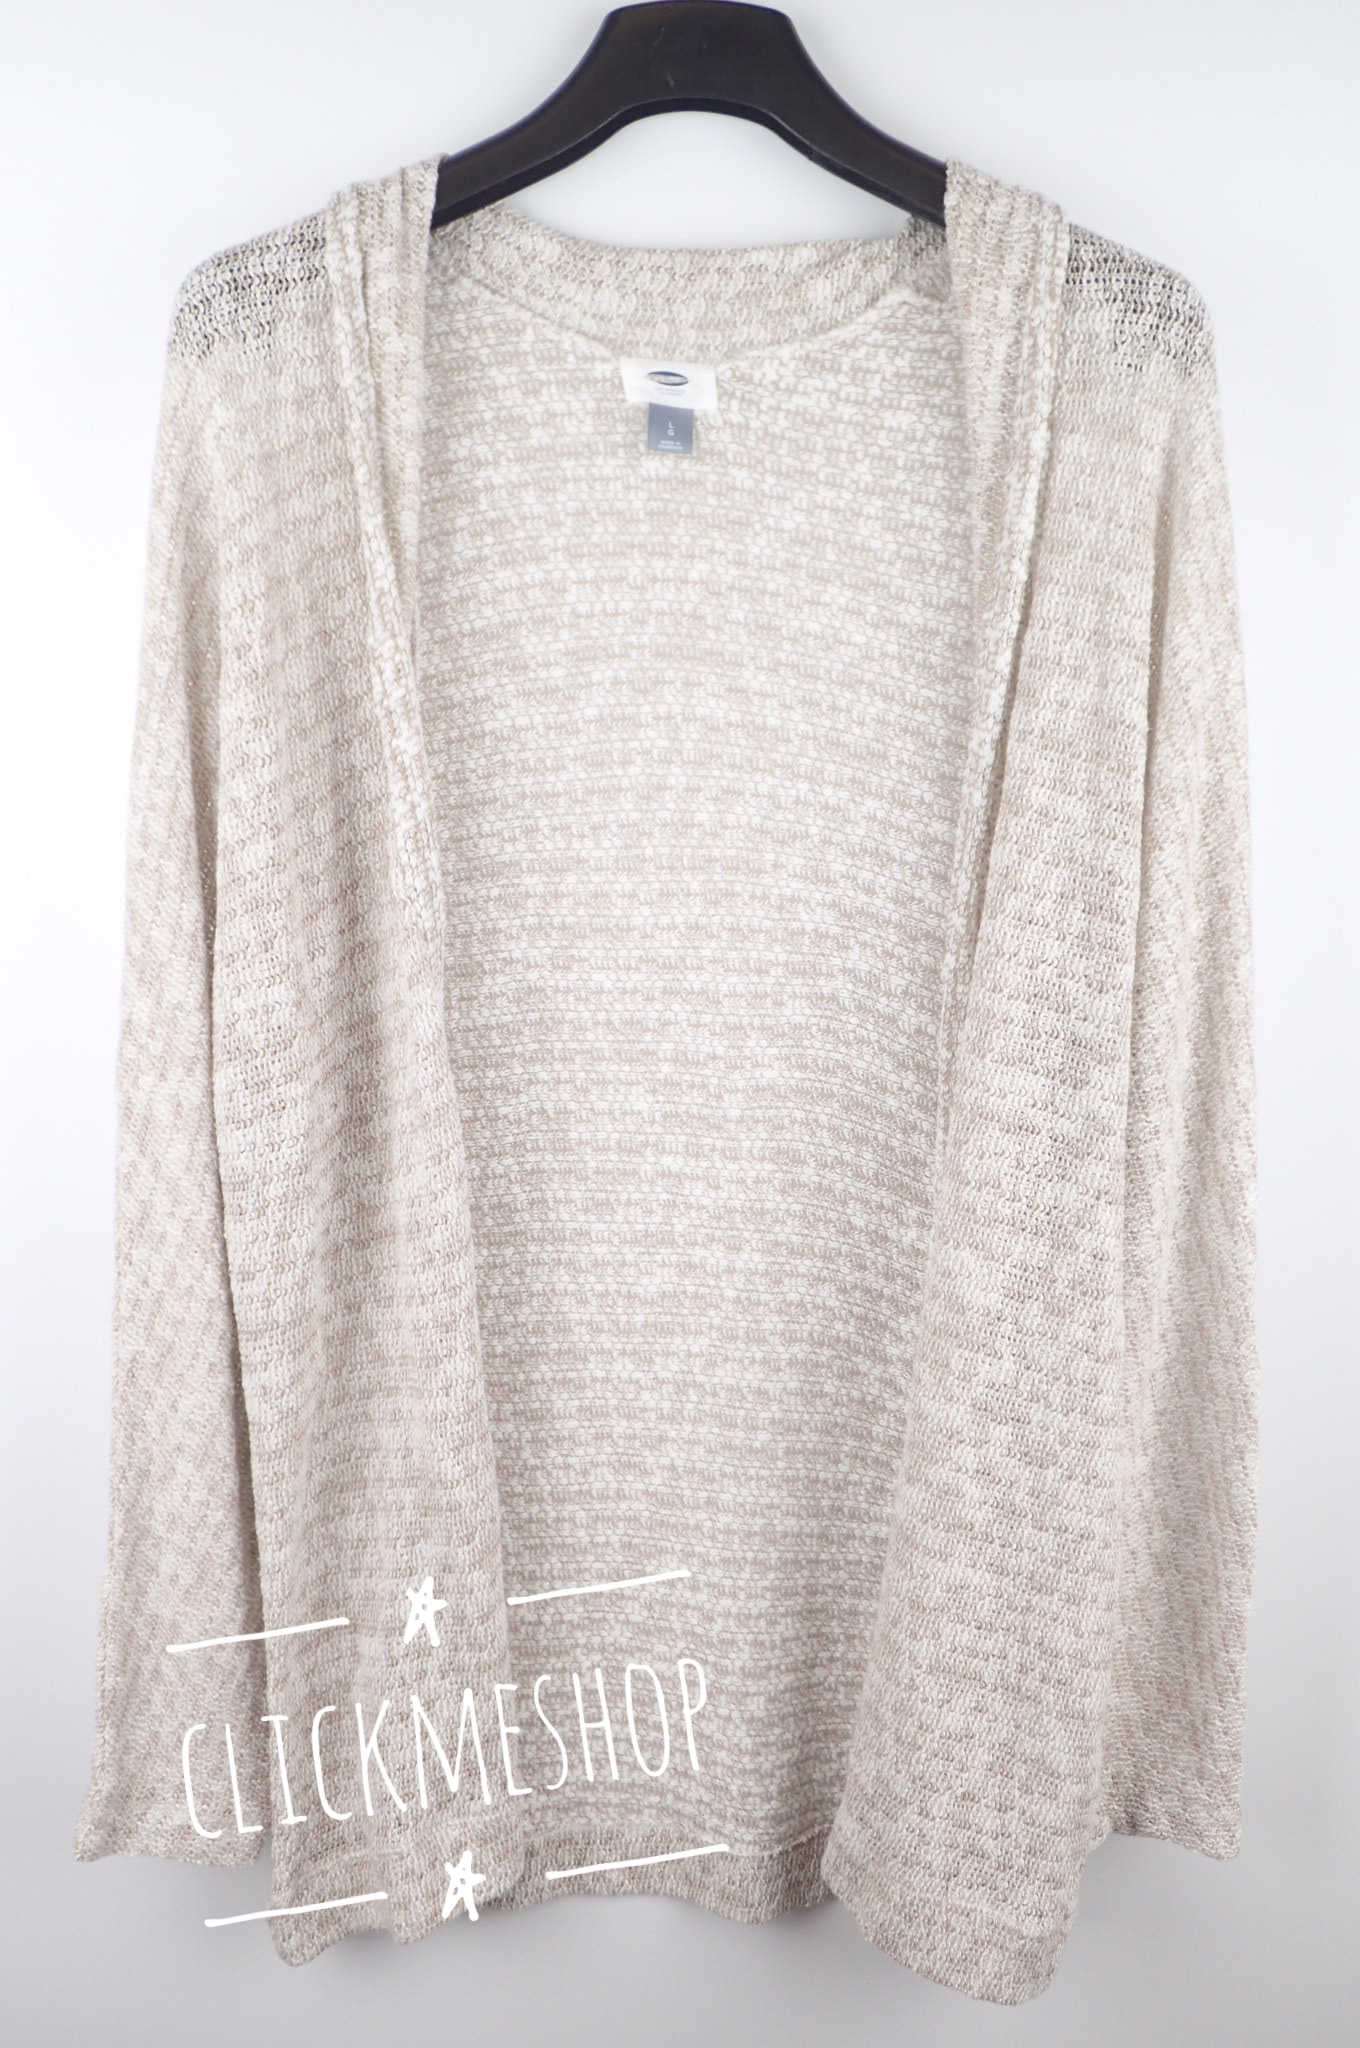 (size XXL หน้าอก 50-52 นิ้ว ) เสื้อคลุม Oldnavy สีน้ำตาลอ่อน ใส่คลุมสบายๆ น่ารักคะ สำเนา สำเนา